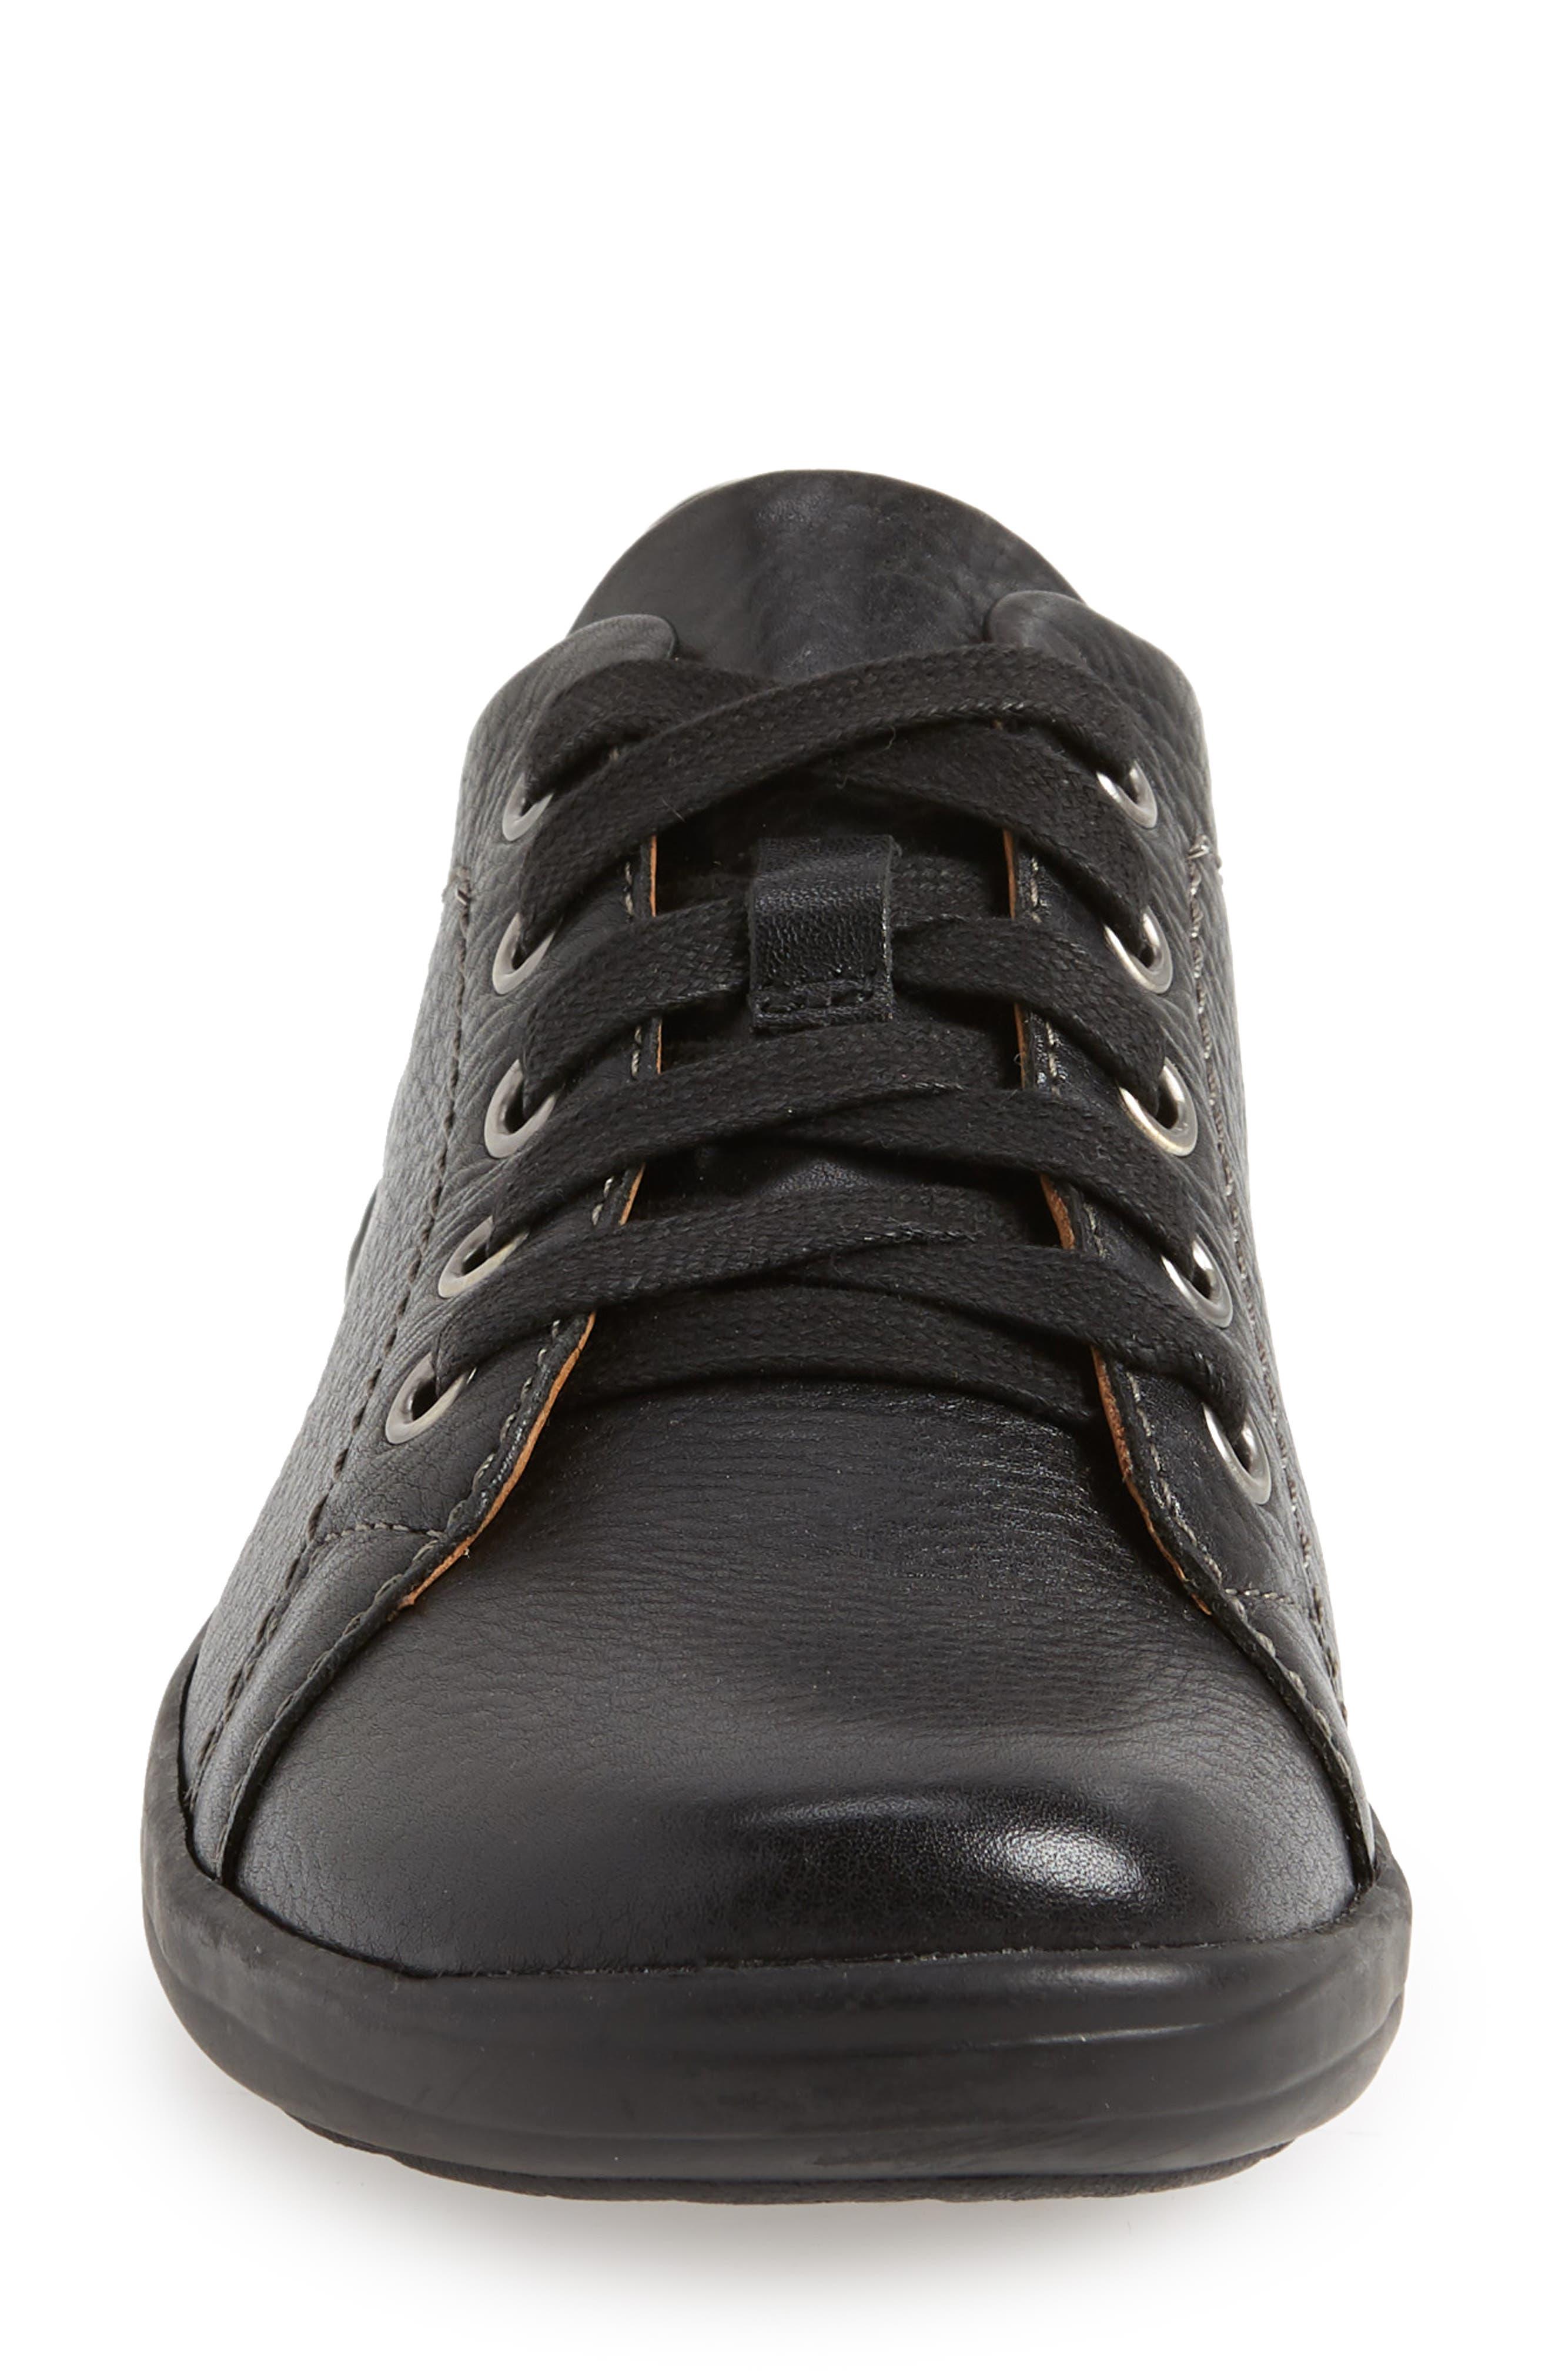 Reston Sneaker,                             Alternate thumbnail 4, color,                             BLACK